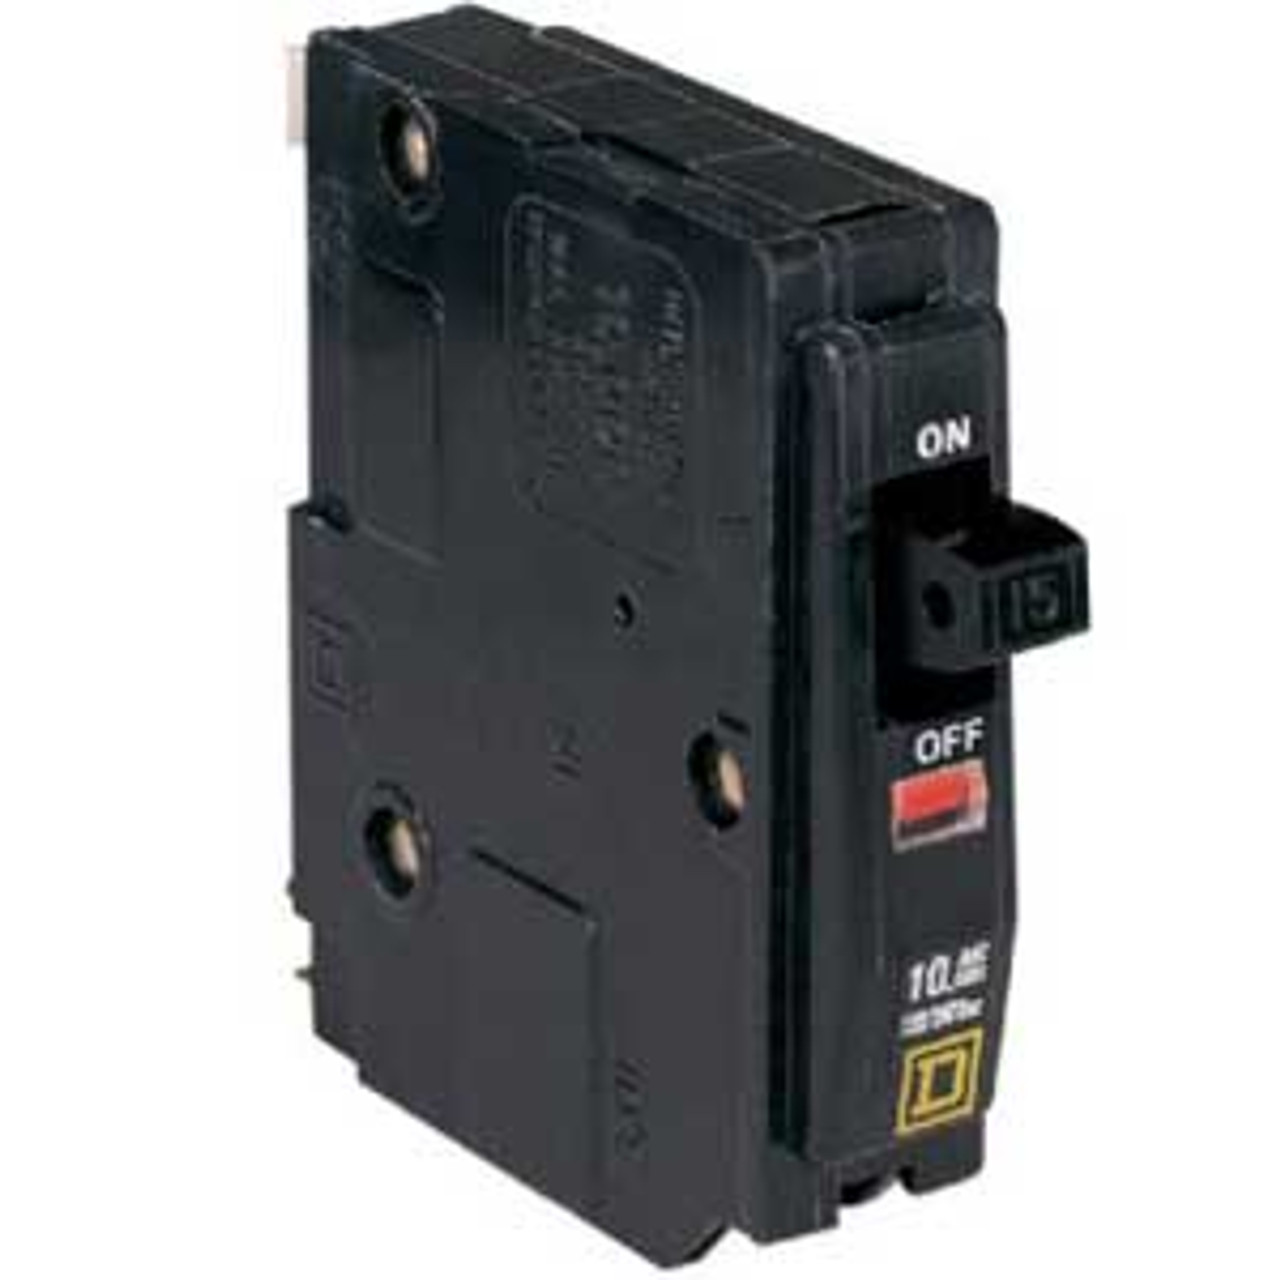 Square D QO120PL5393 1 Pole 20 Amp 120/240VAC Circuit Breaker - New